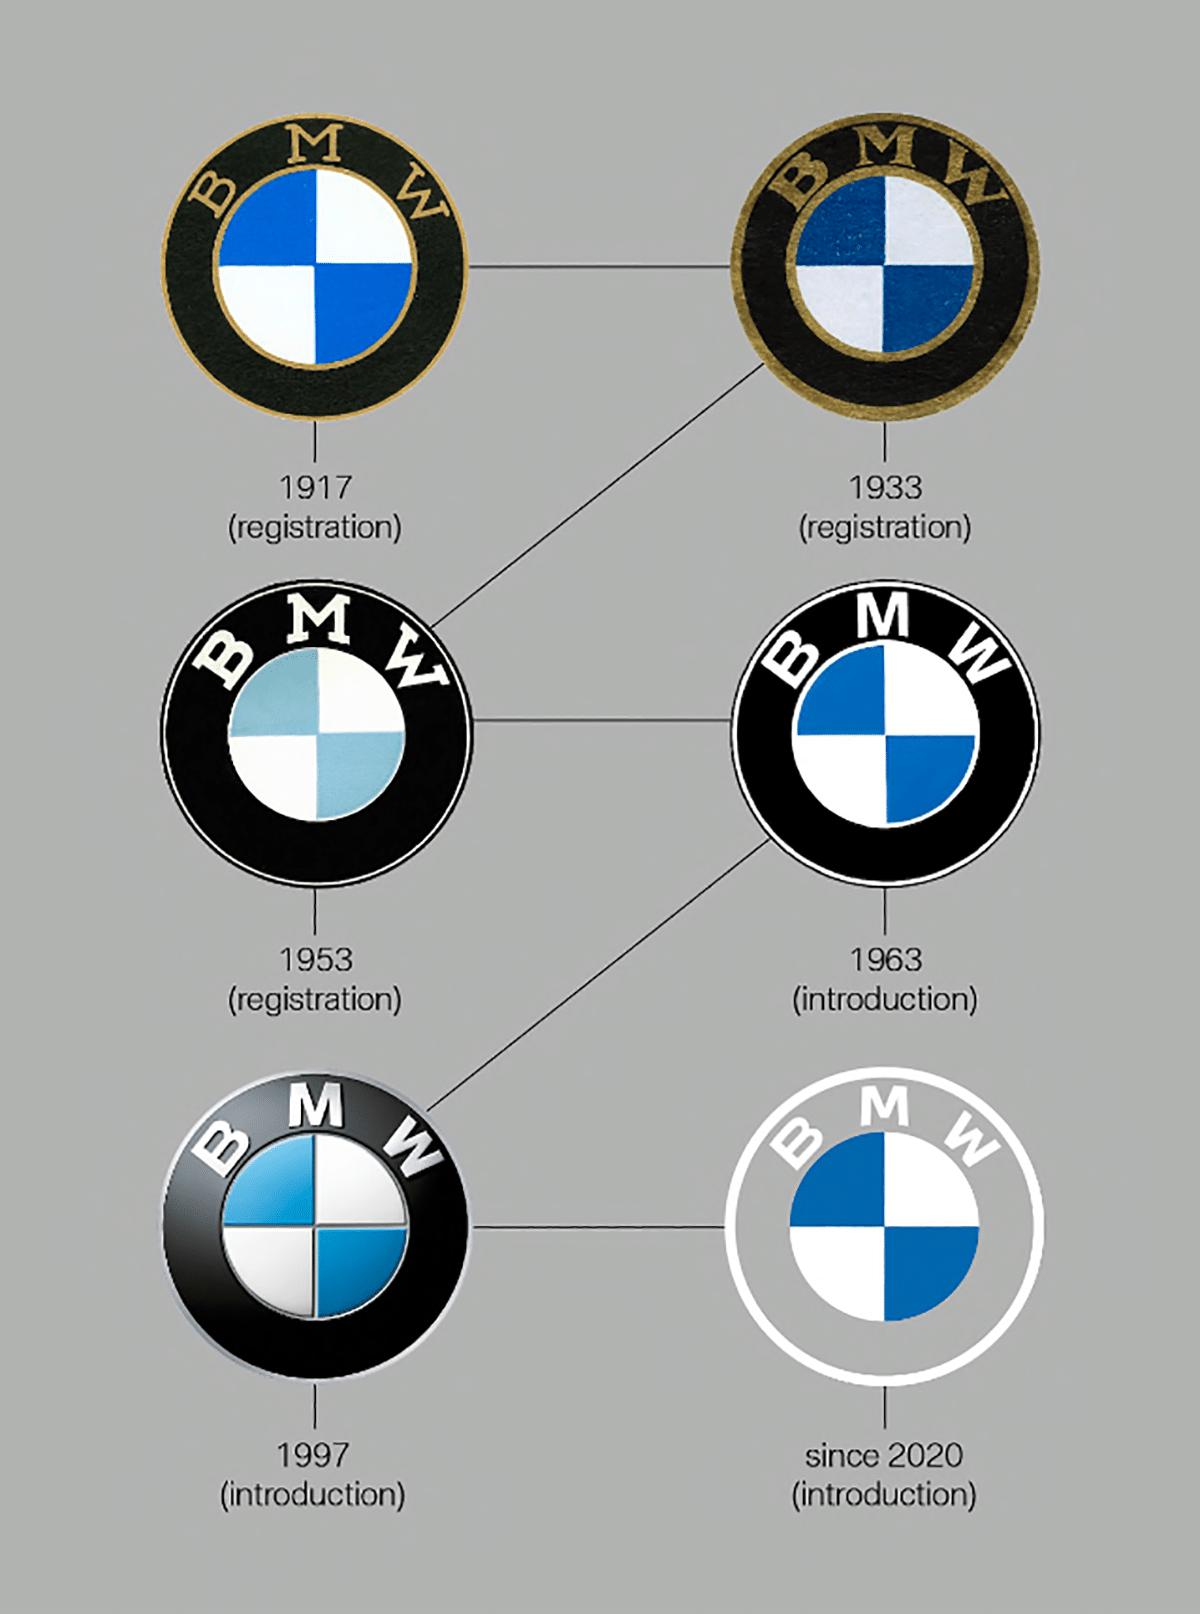 Historial del logo BMW